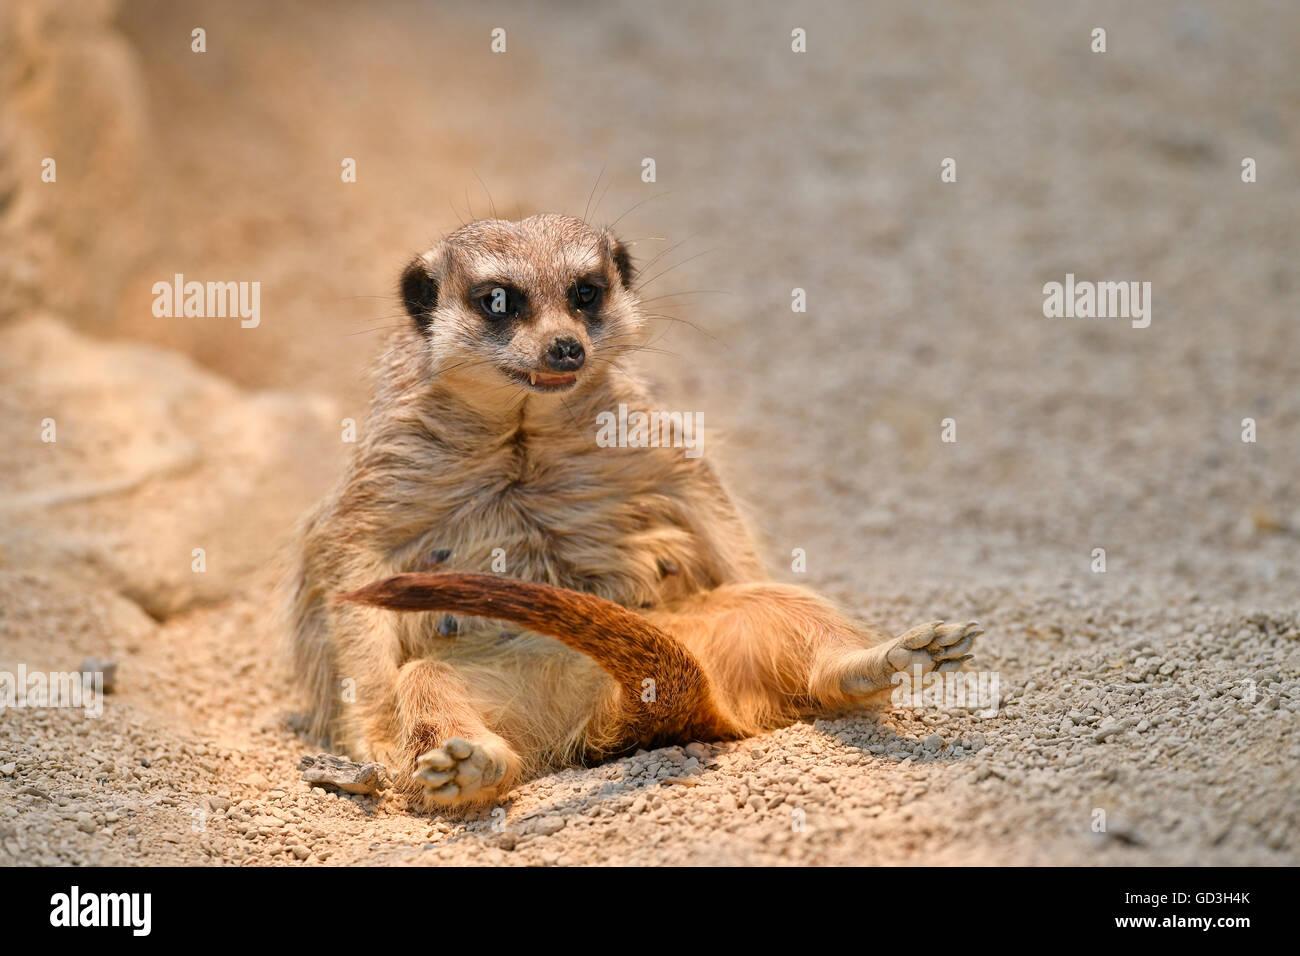 Meerkat (Suricata suricatta), offspring, captive - Stock Image